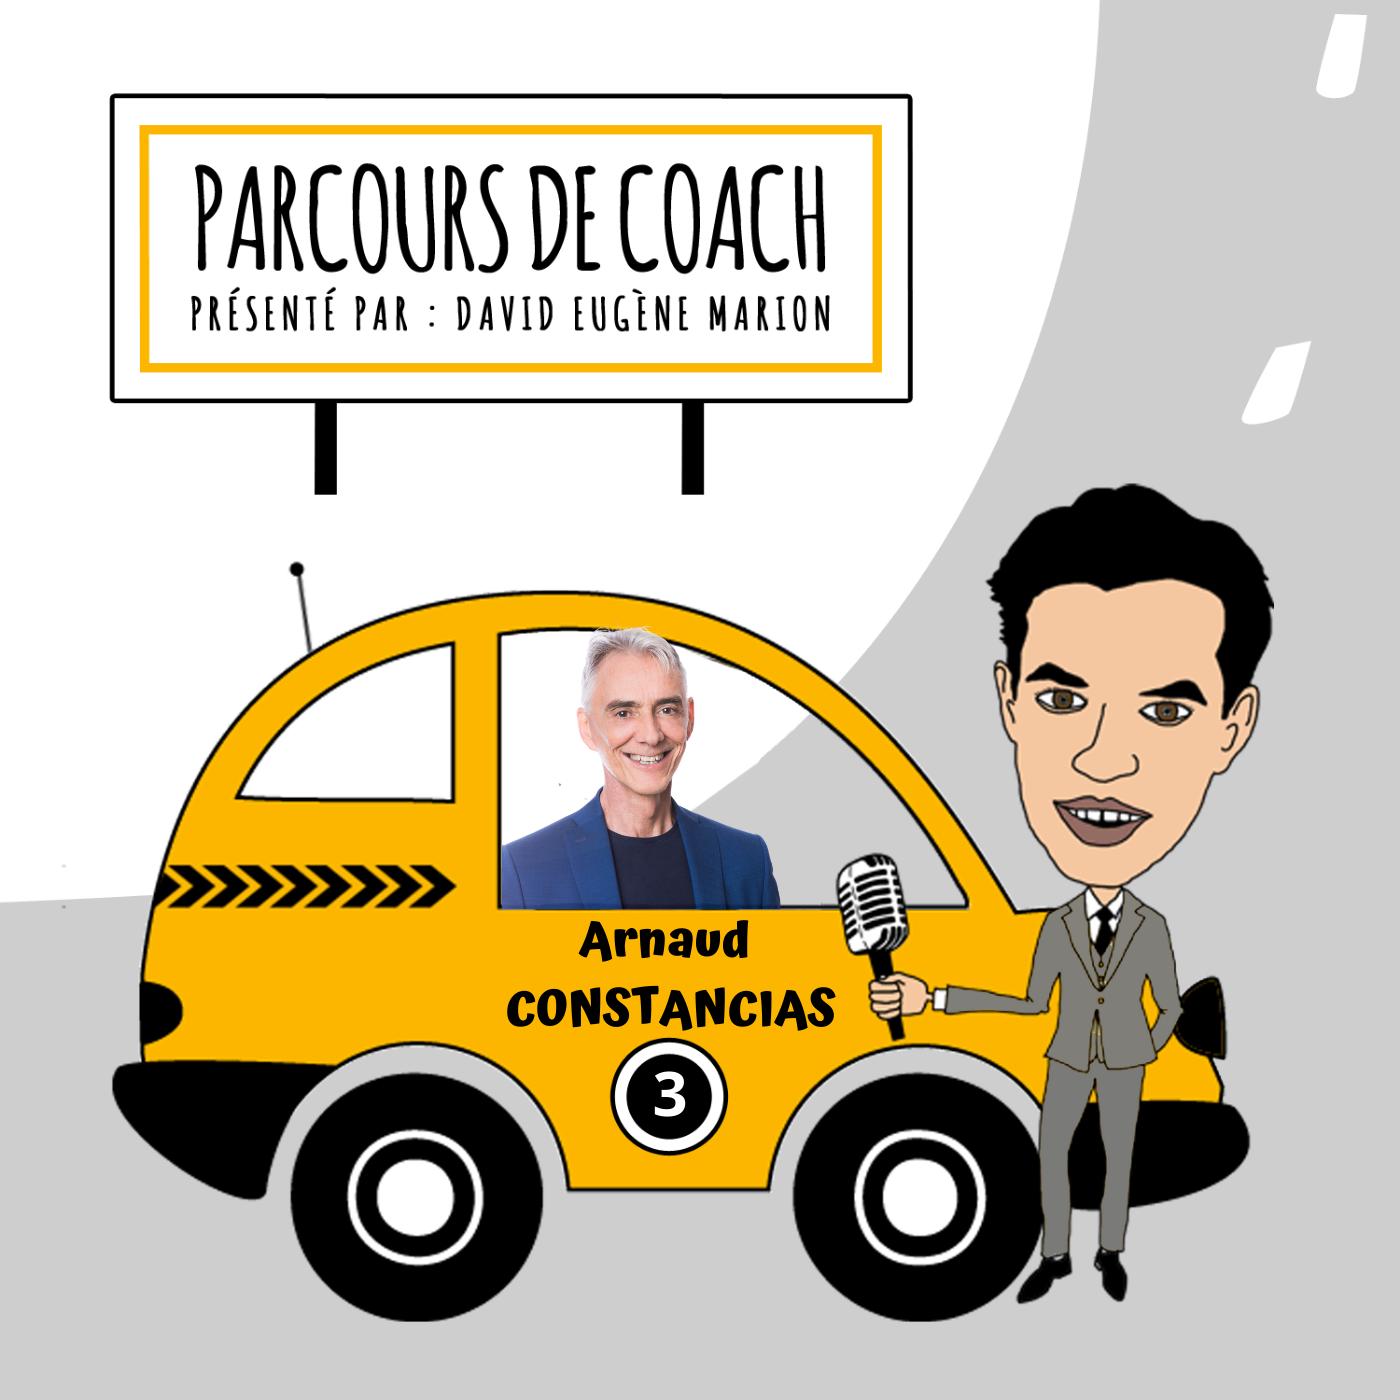 Parcours de Coach® n°3 : Arnaud CONSTANCIAS